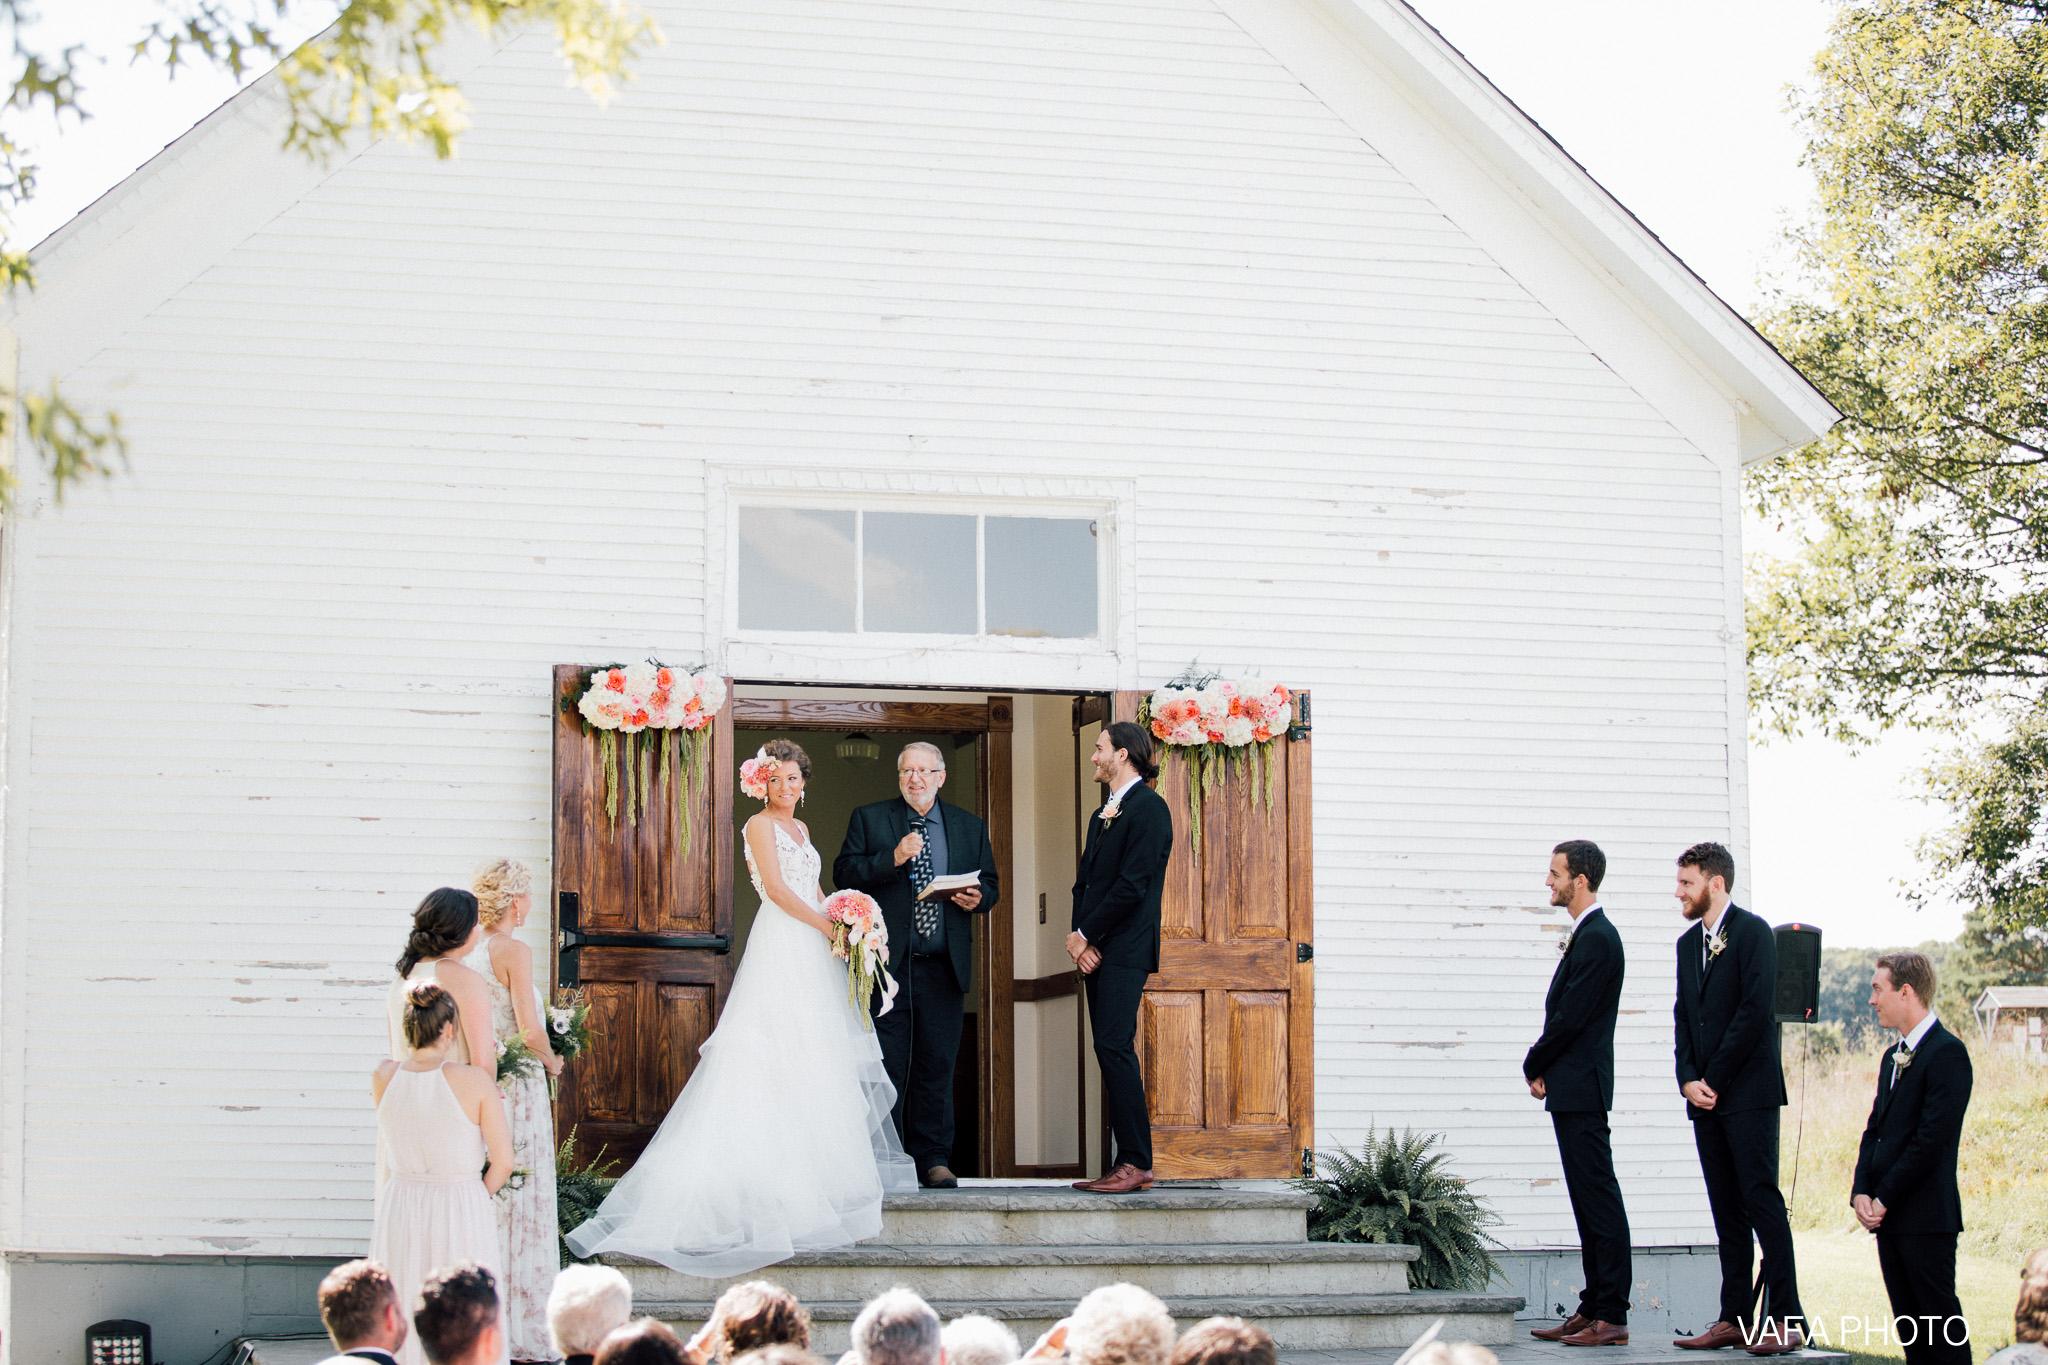 The-Felt-Estate-Wedding-Kailie-David-Vafa-Photo-335.jpg